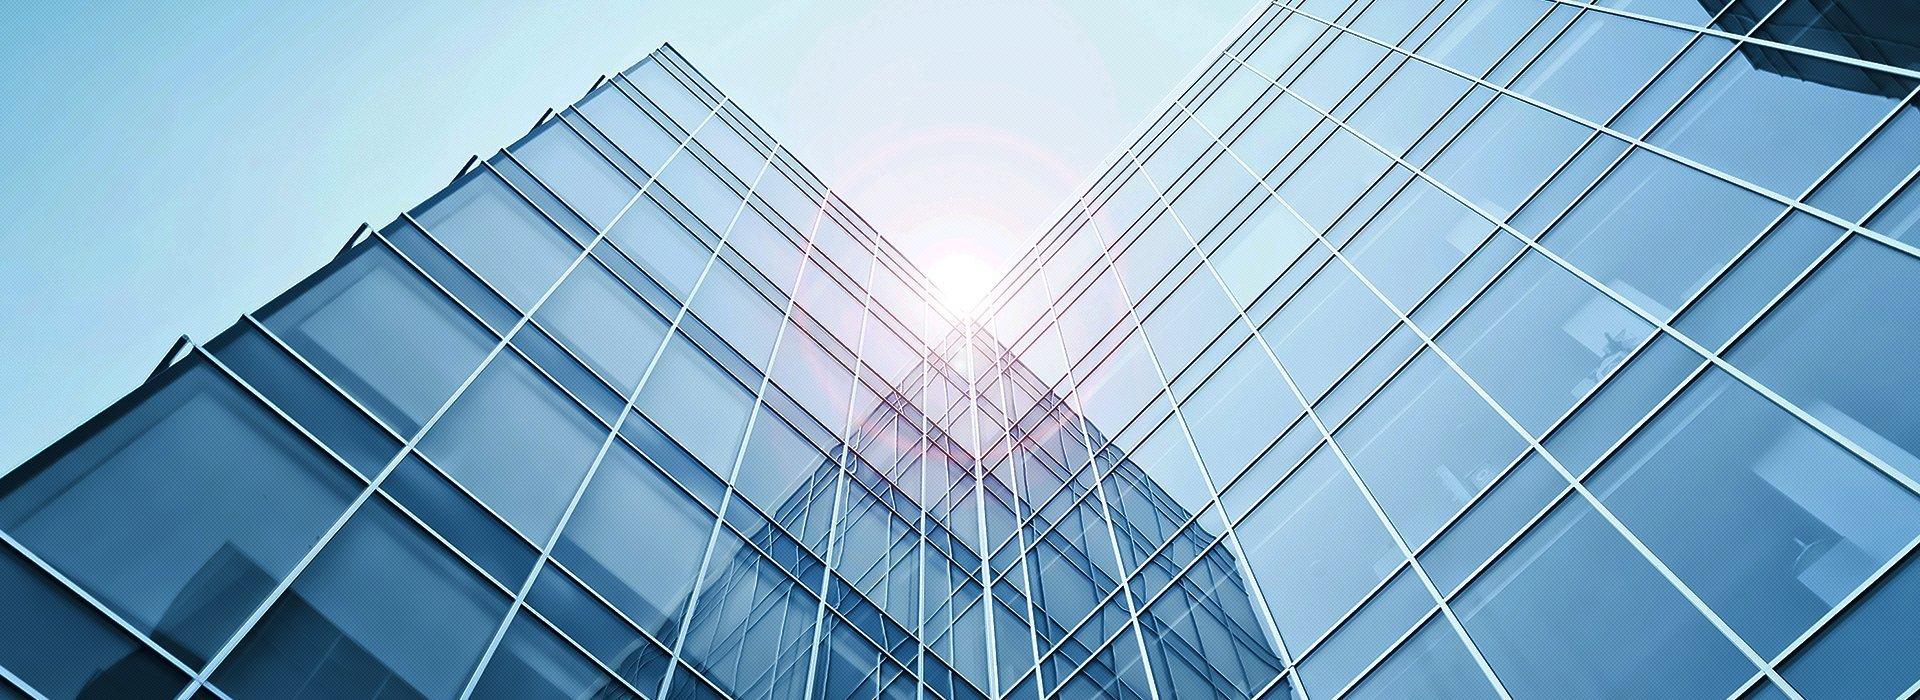 A high rise building